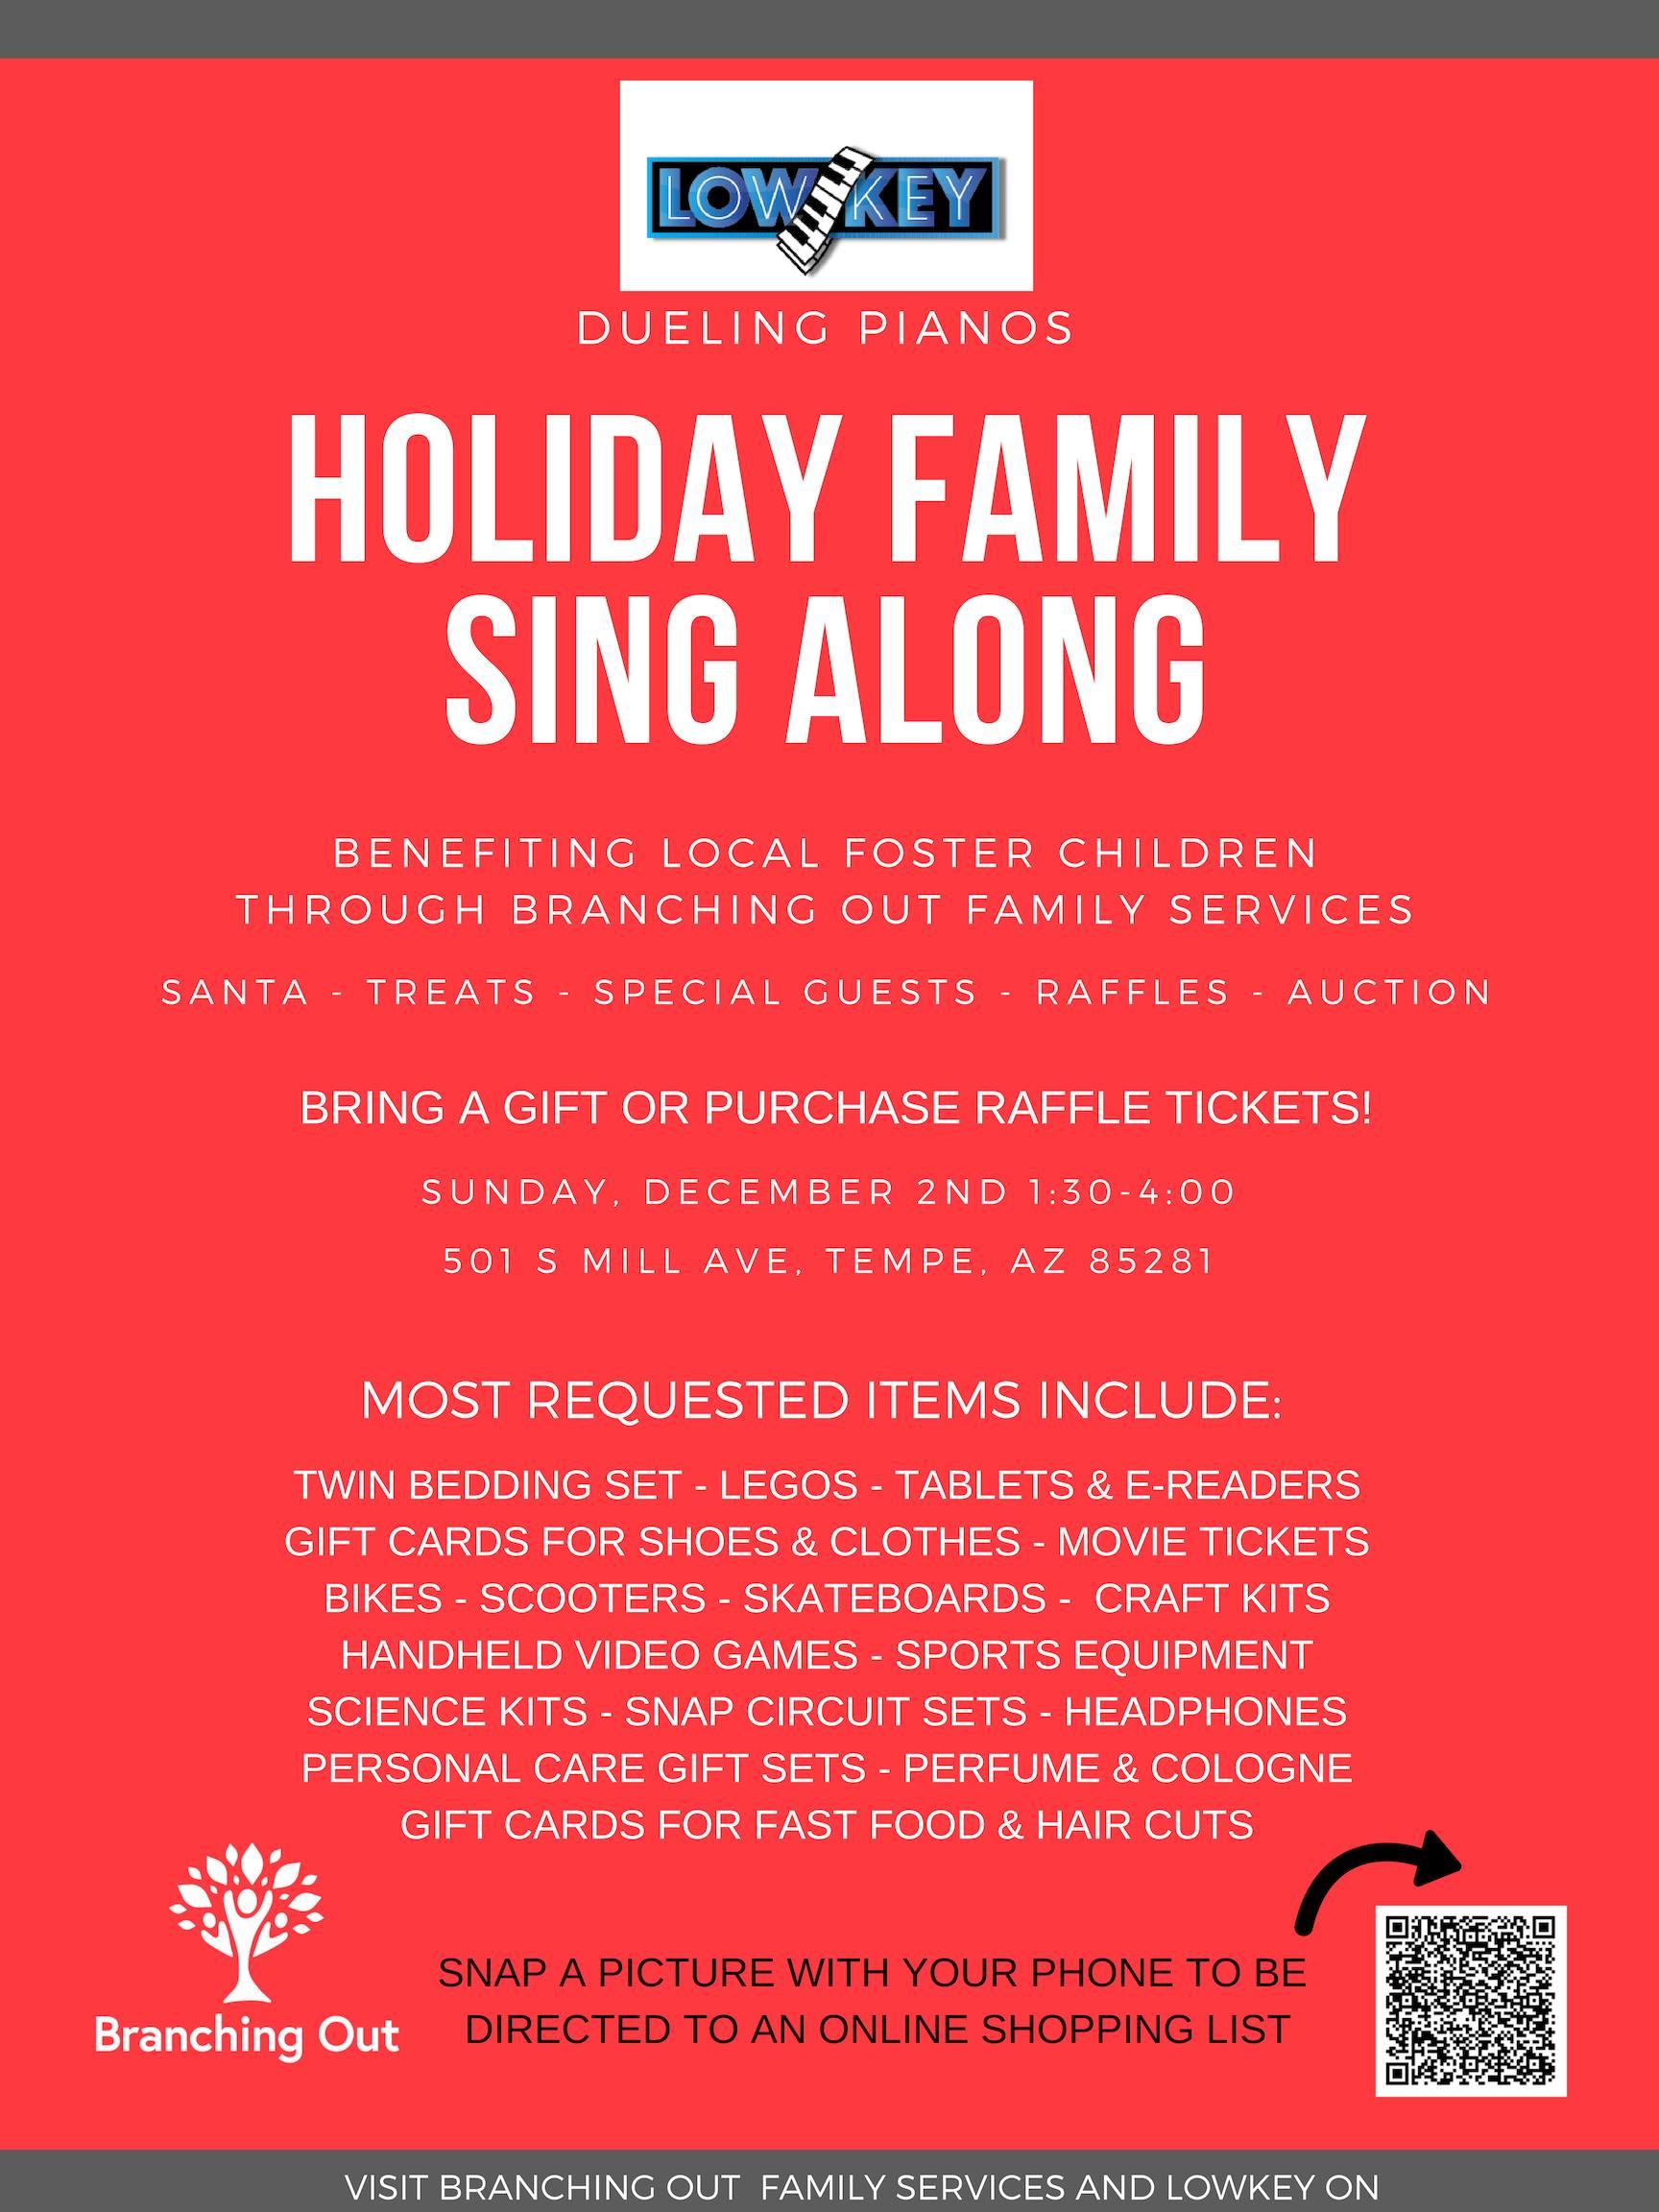 Holiday Family Sing Along At LowKey